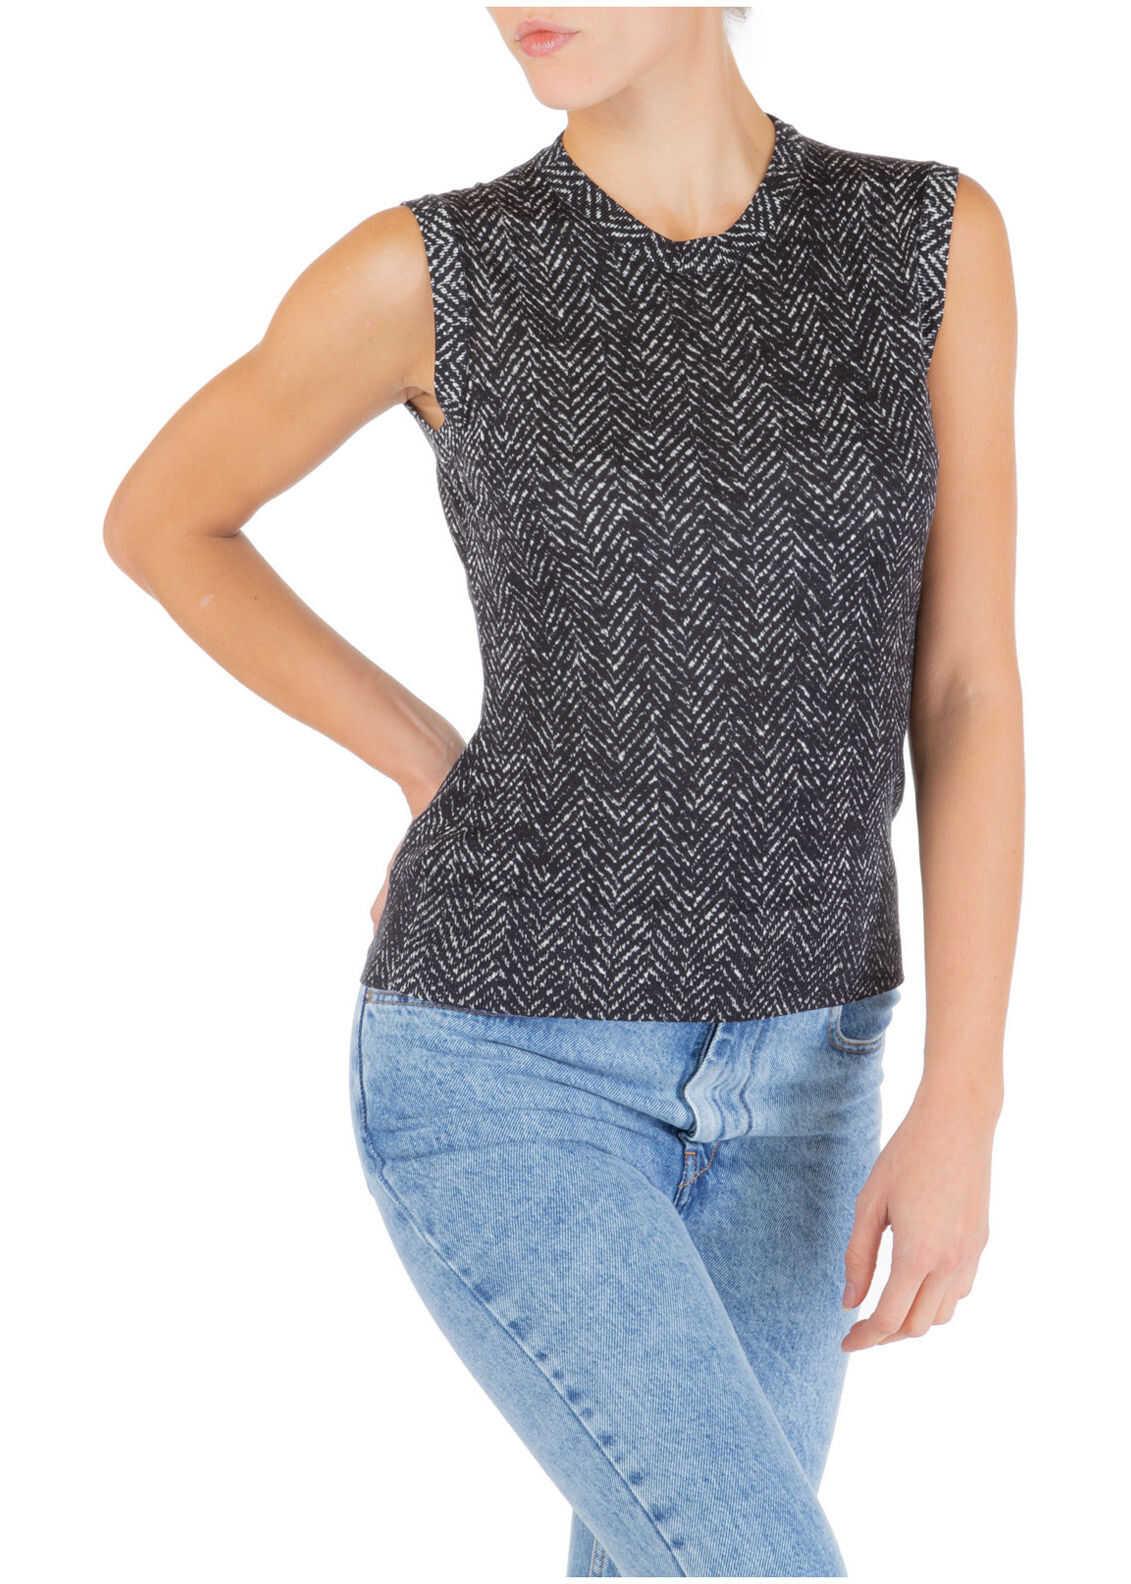 Dolce & Gabbana Top Vest Black